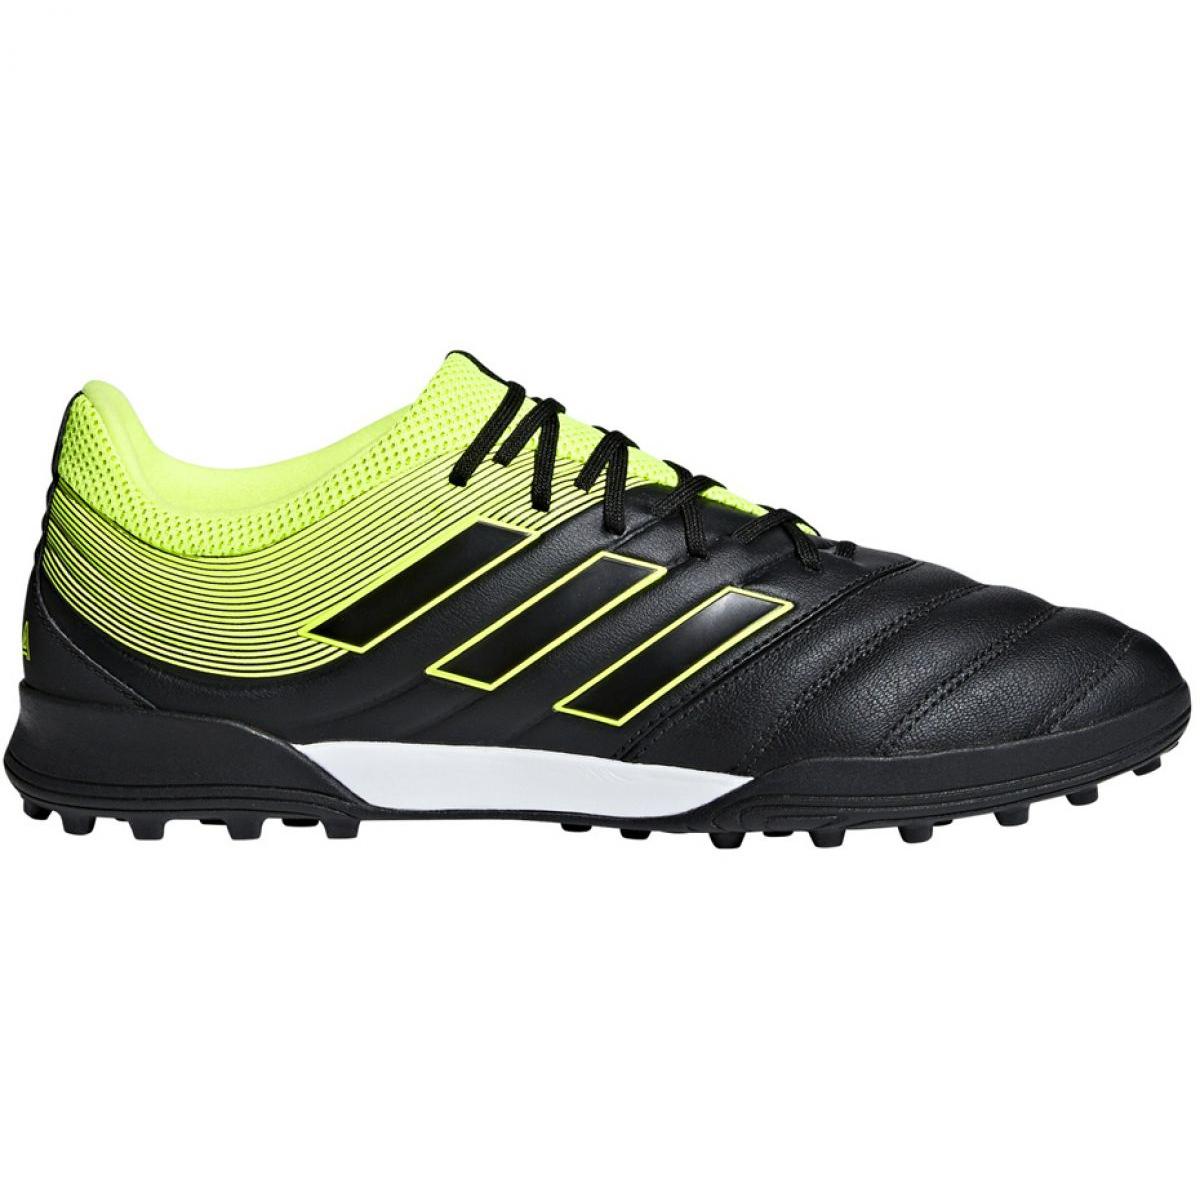 Chaussures de foot adidas Copa Mundial TF Rouge Crampons De